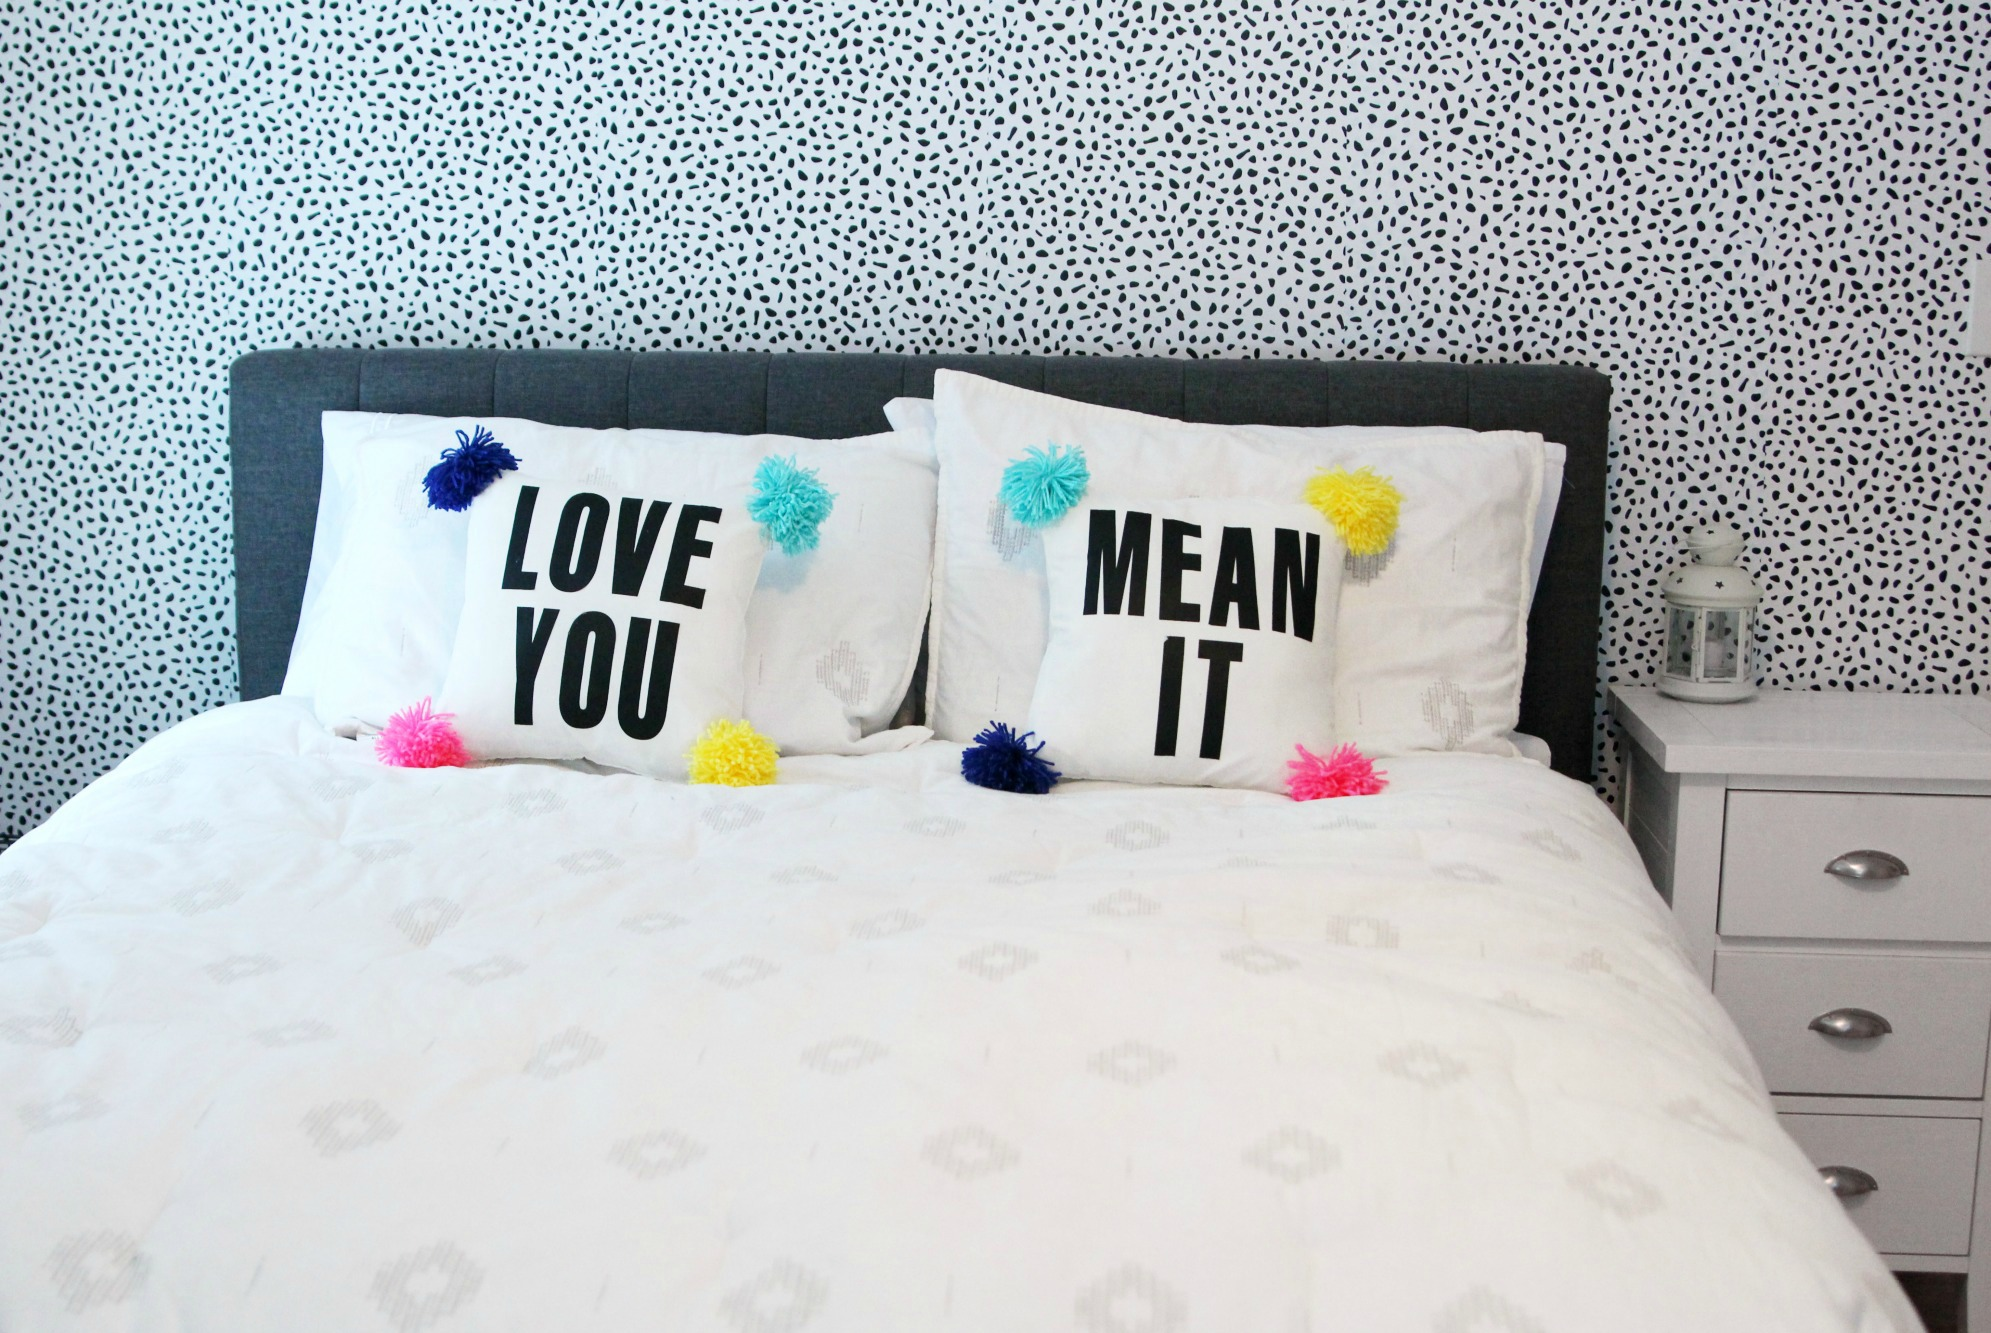 DIY Love Your Pom Pom Pillow with Text | No-Sew Pillowcase